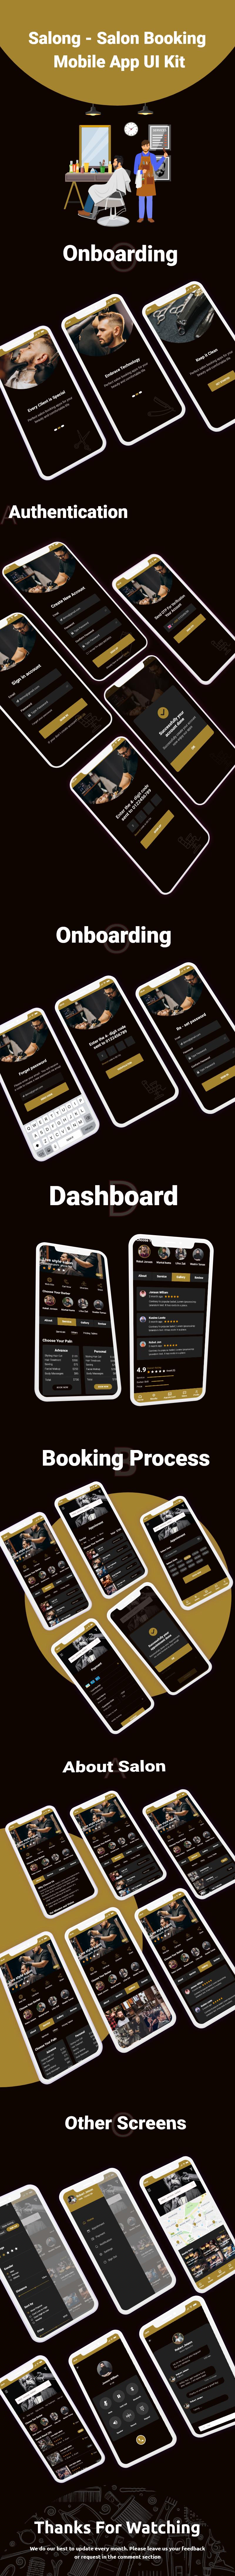 Salong - Salon Booking Mobile App UI Kit - 2